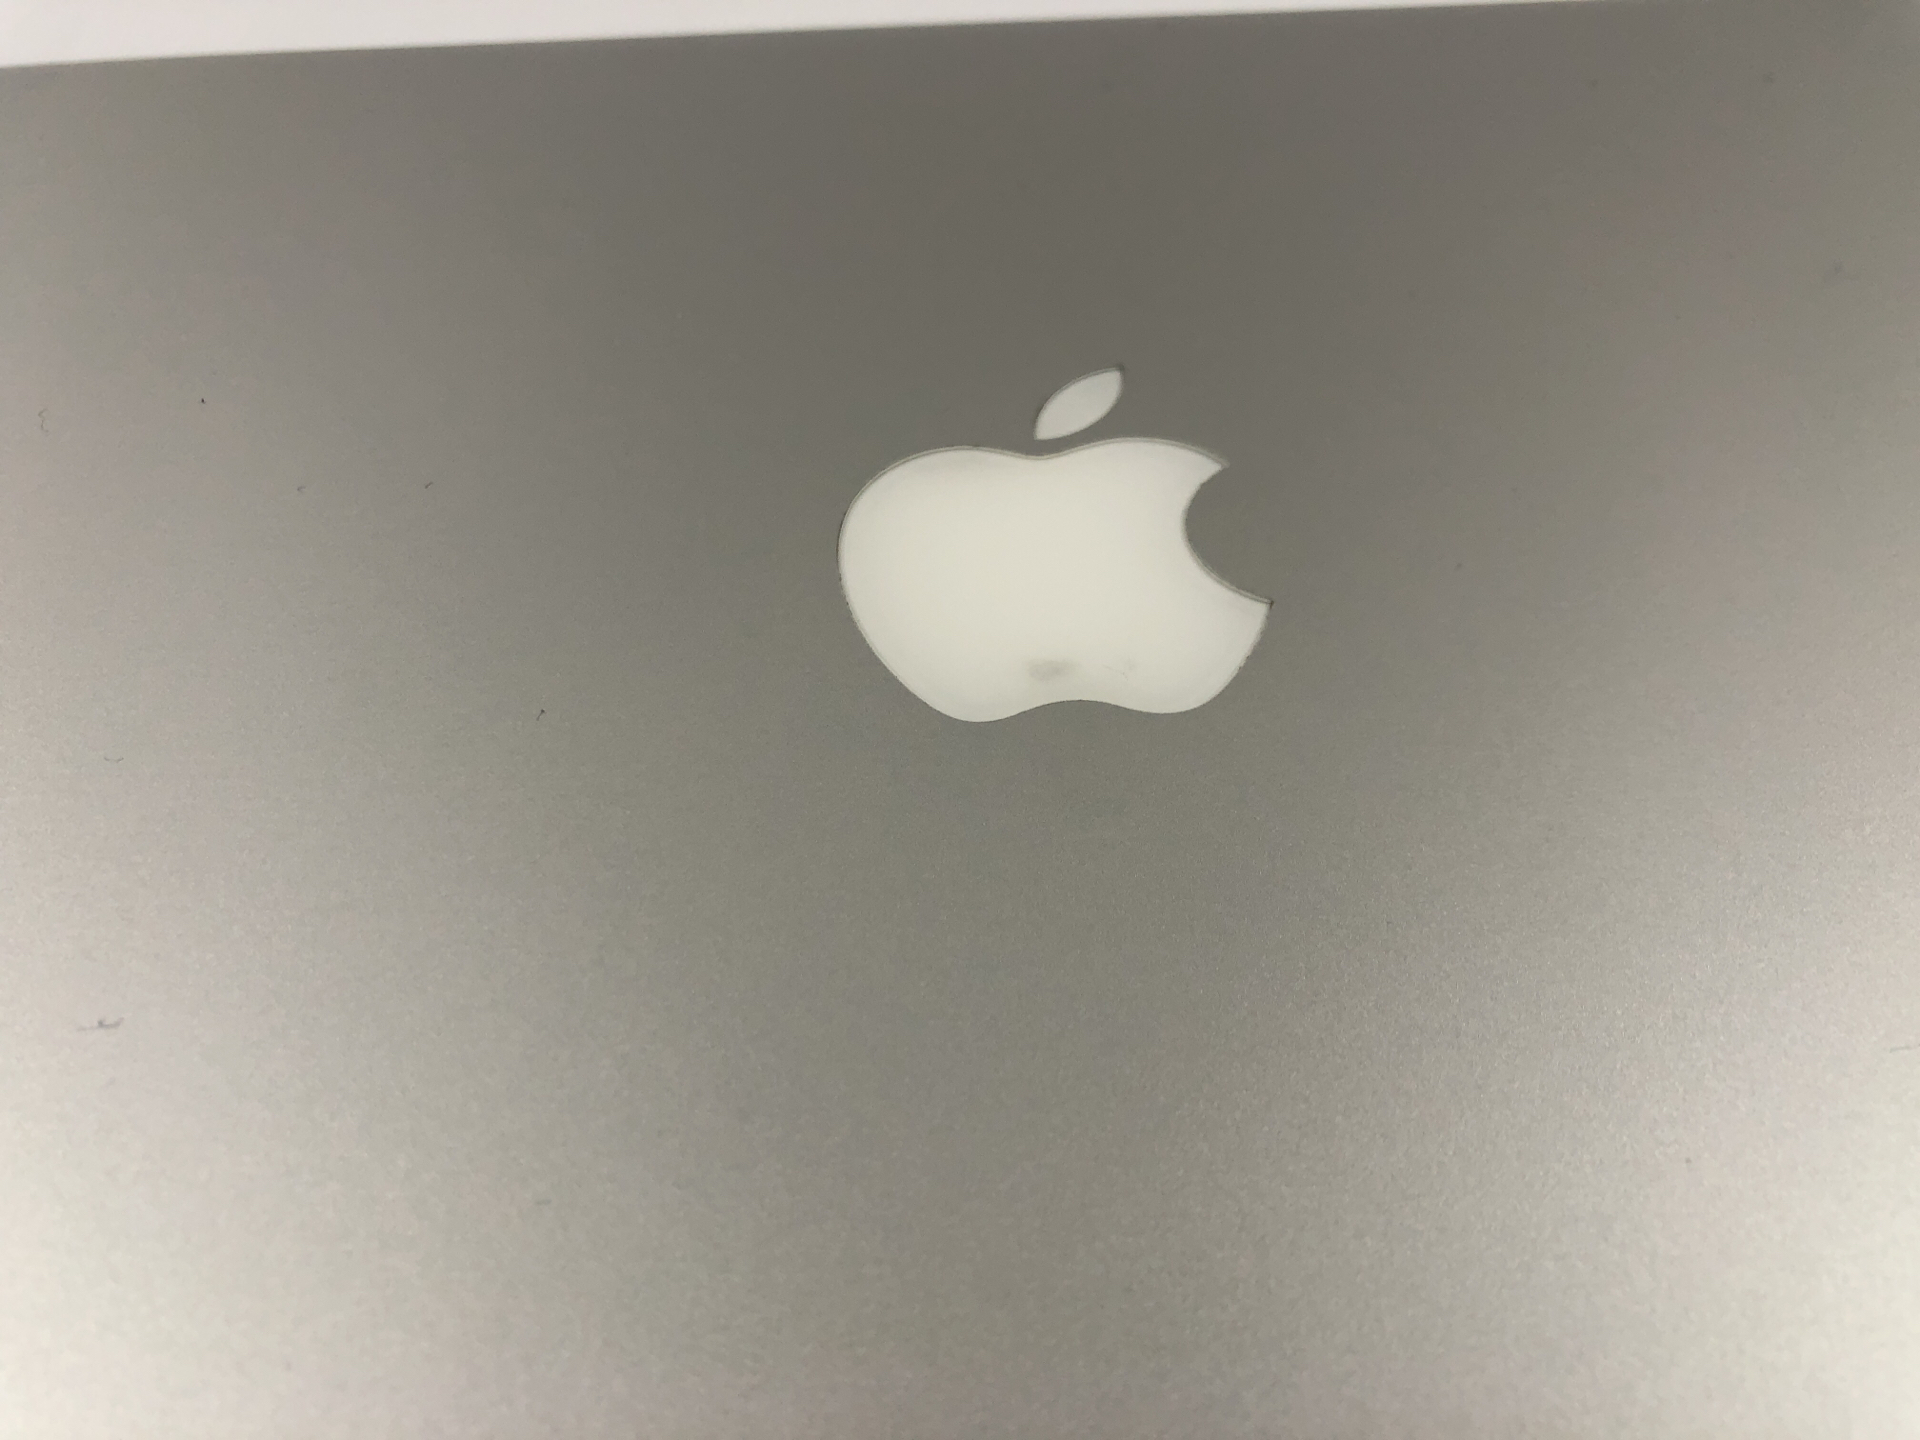 "MacBook Pro Retina 13"" Early 2015 (Intel Core i5 2.9 GHz 8 GB RAM 512 GB SSD), Intel Core i5 2.9 GHz, 8 GB RAM, 512 GB SSD, bild 4"